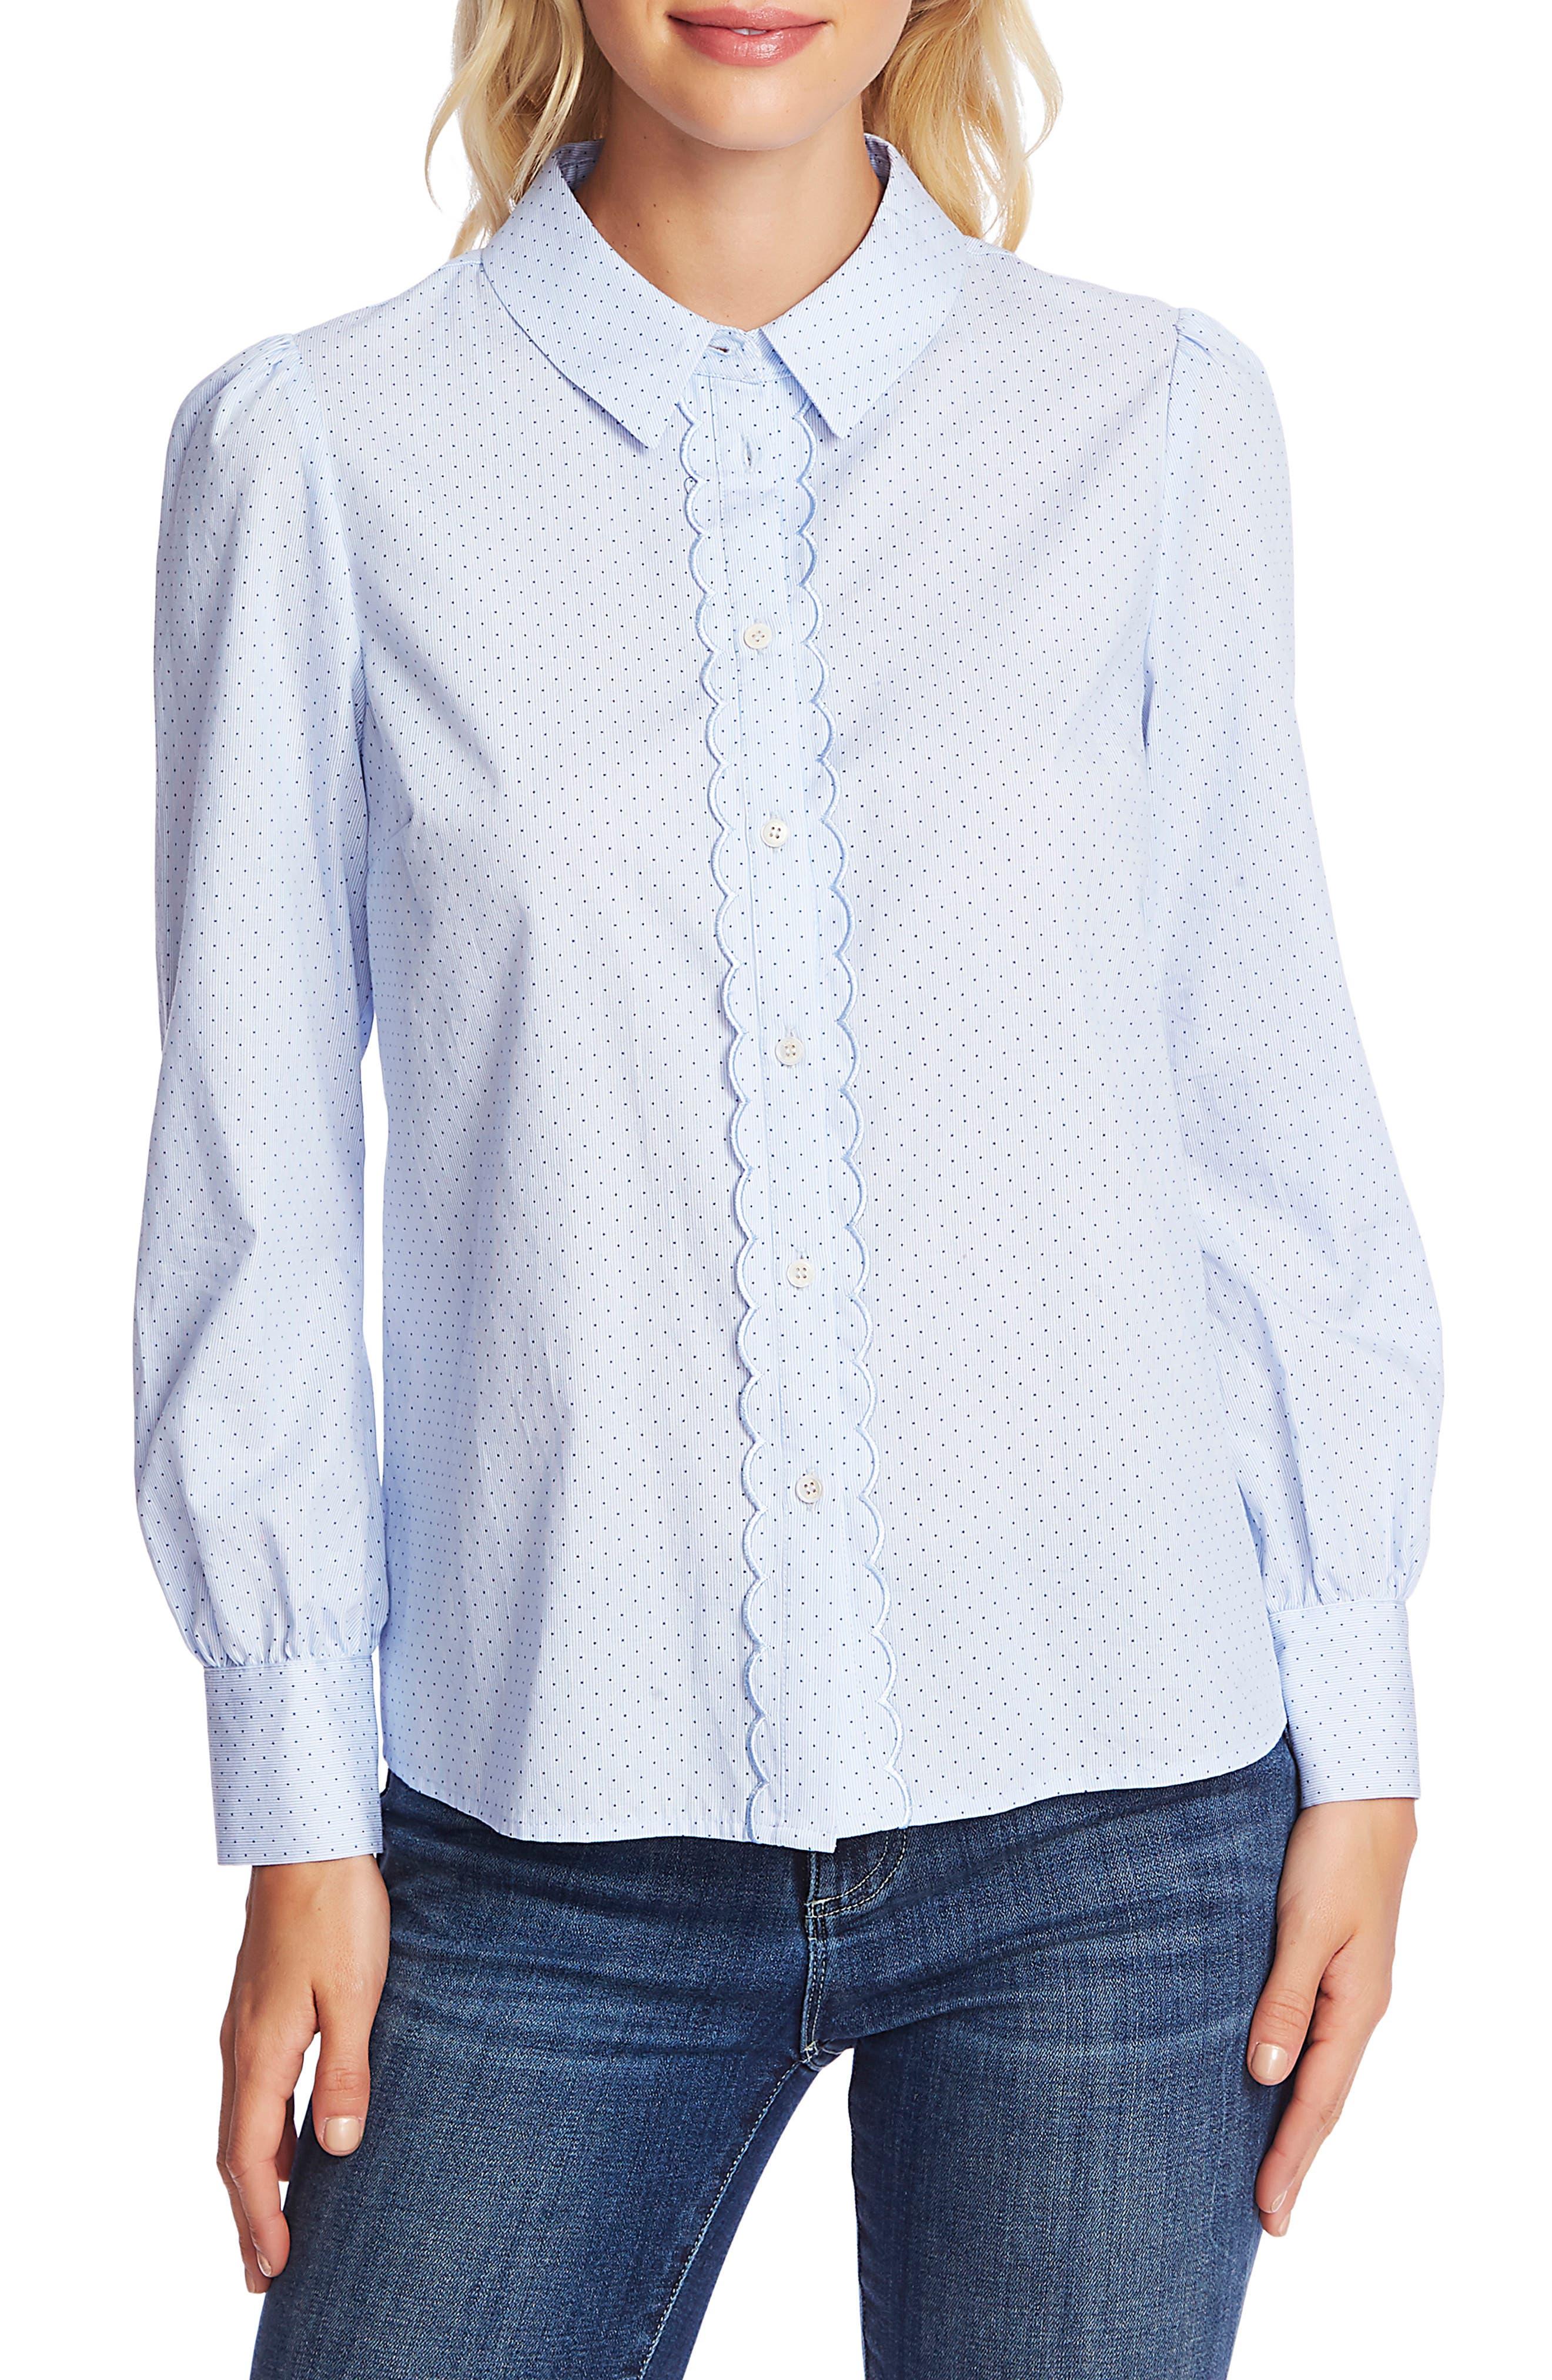 Vintage Tops & Retro Shirts, Halter Tops, Blouses Womens Cece Pin Dot Scallop Placket Cotton Blouse $34.97 AT vintagedancer.com